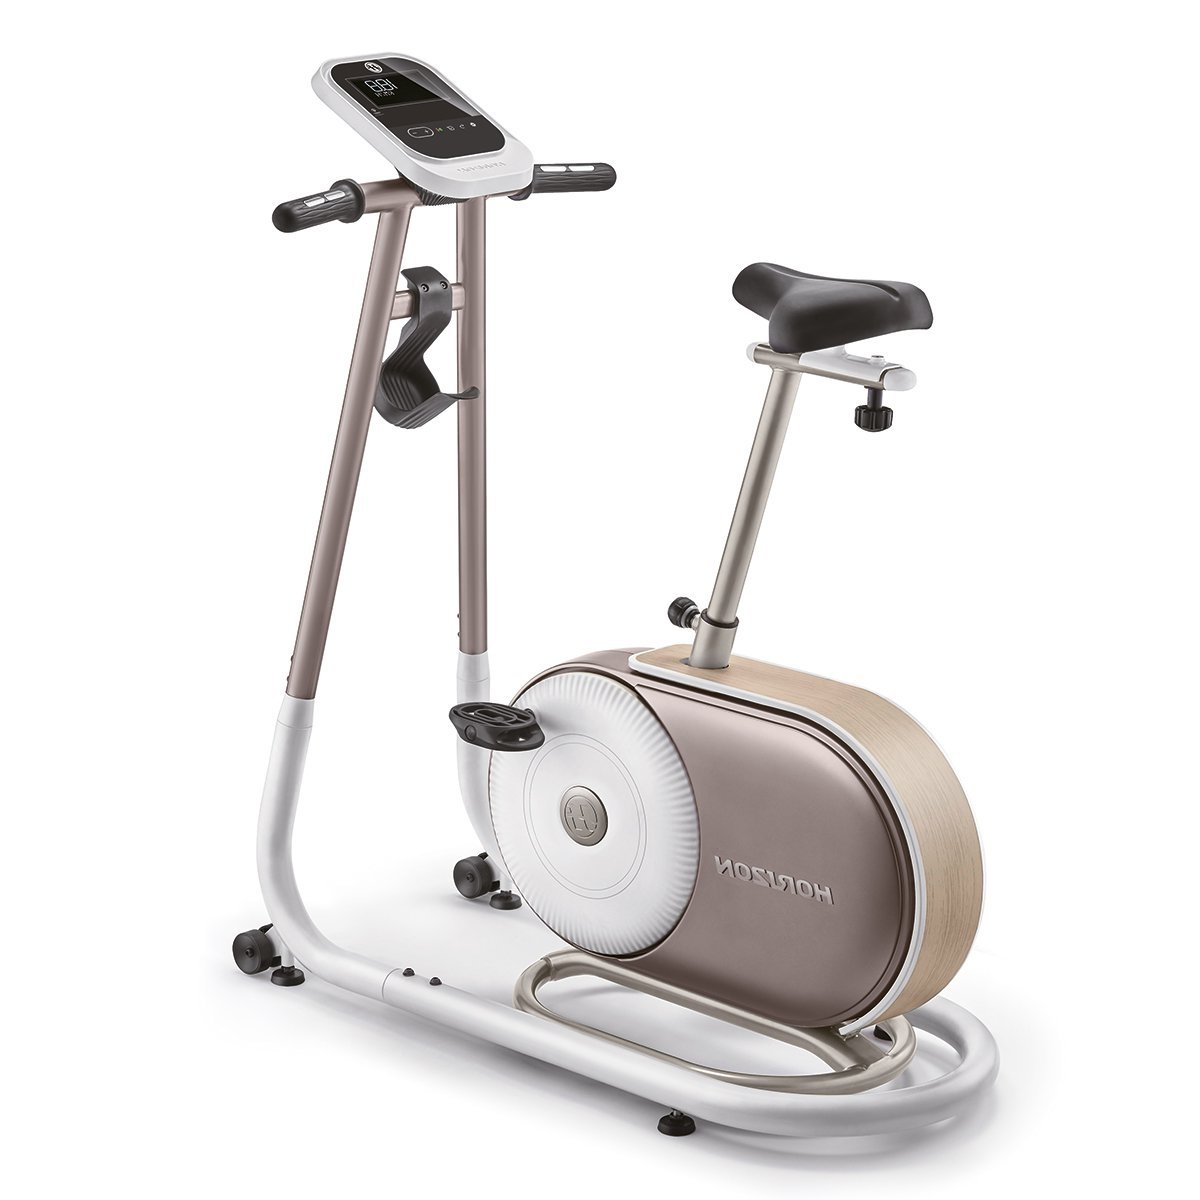 Fahrradtrainer Horizon Citta BT5.1